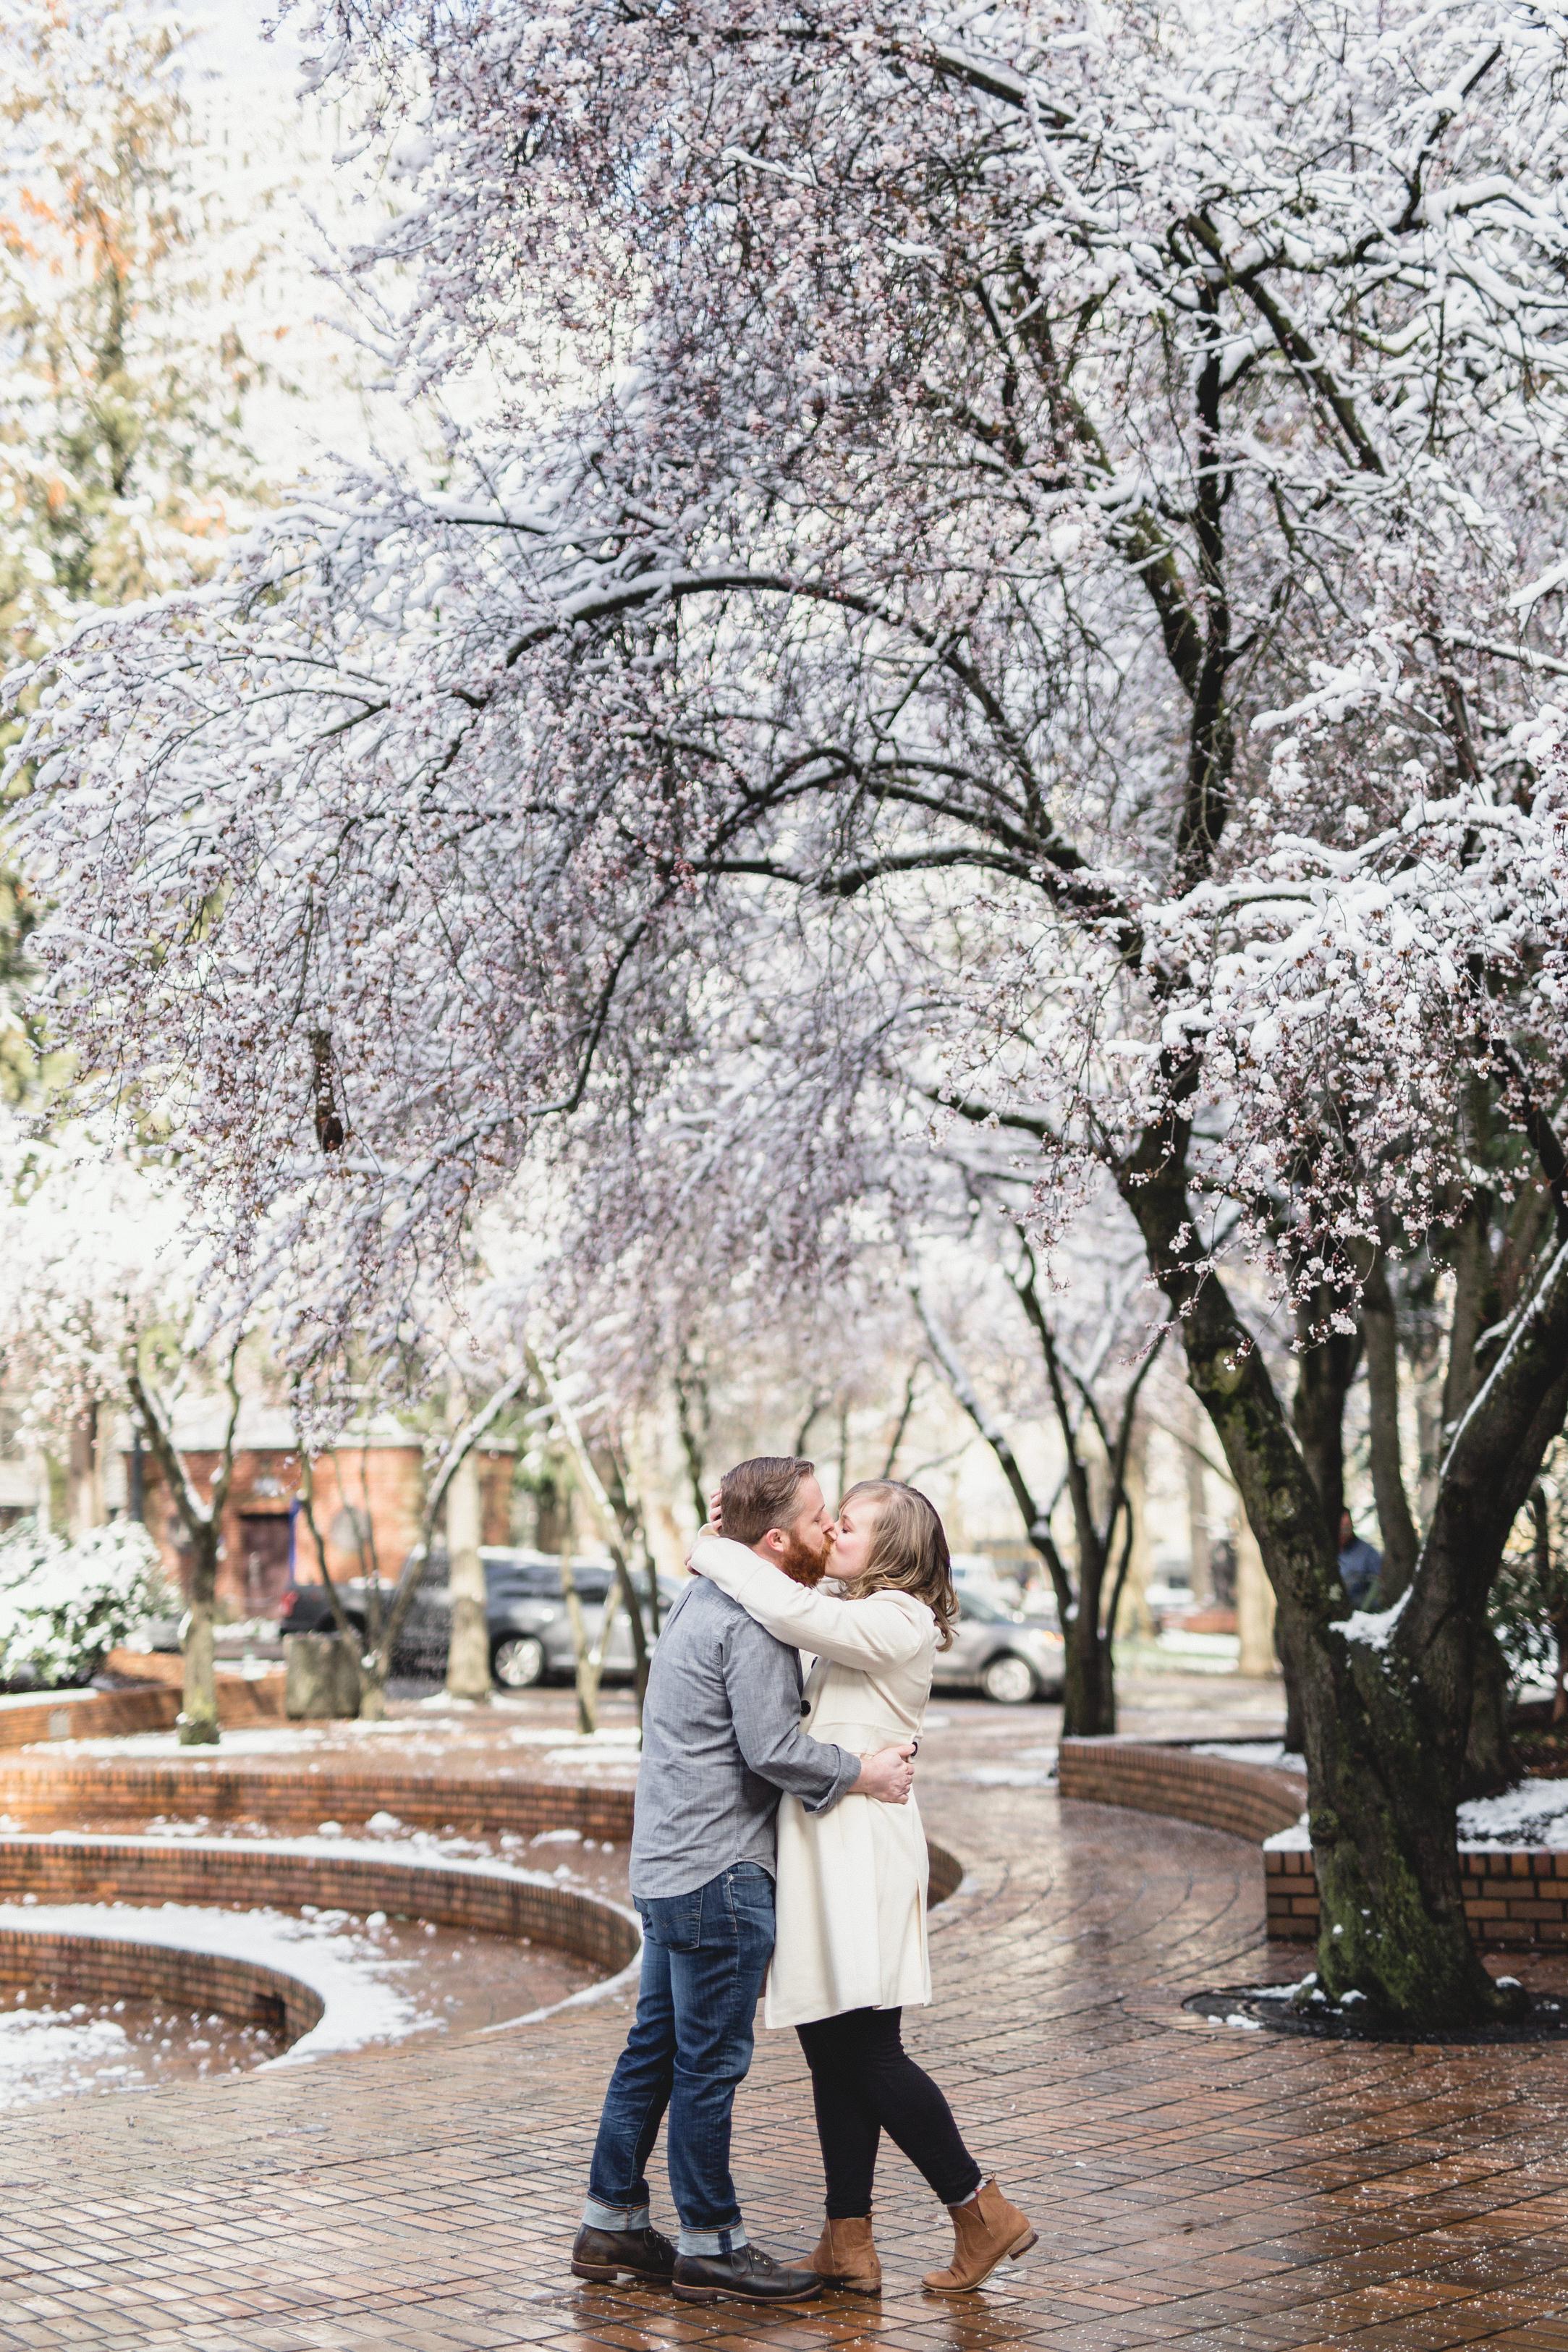 MacCoy Dean Photography Portland Oregon Wedding Photography Downtown Engagement Photoshoot-38.jpg